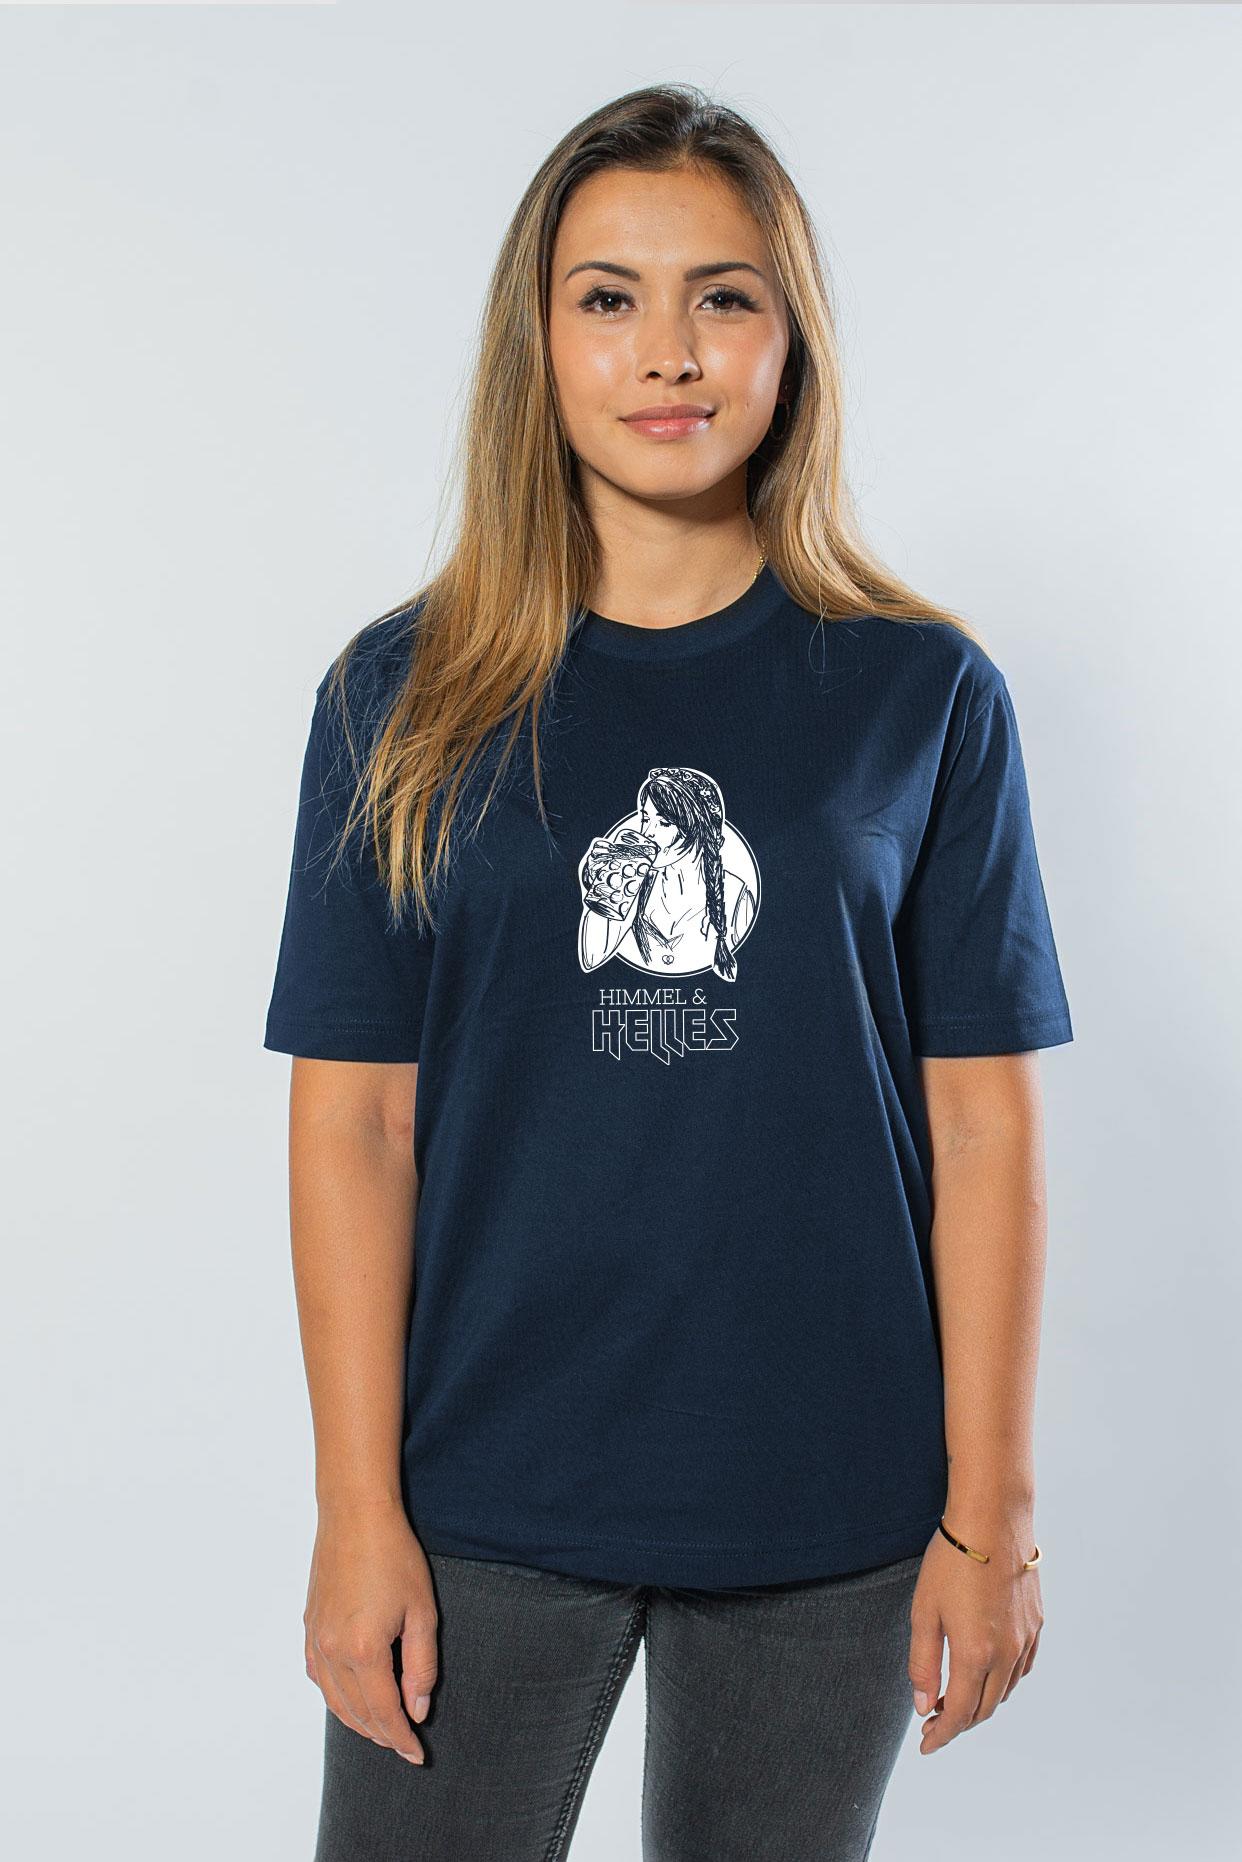 Himmel & Helles Unisex T-Shirt